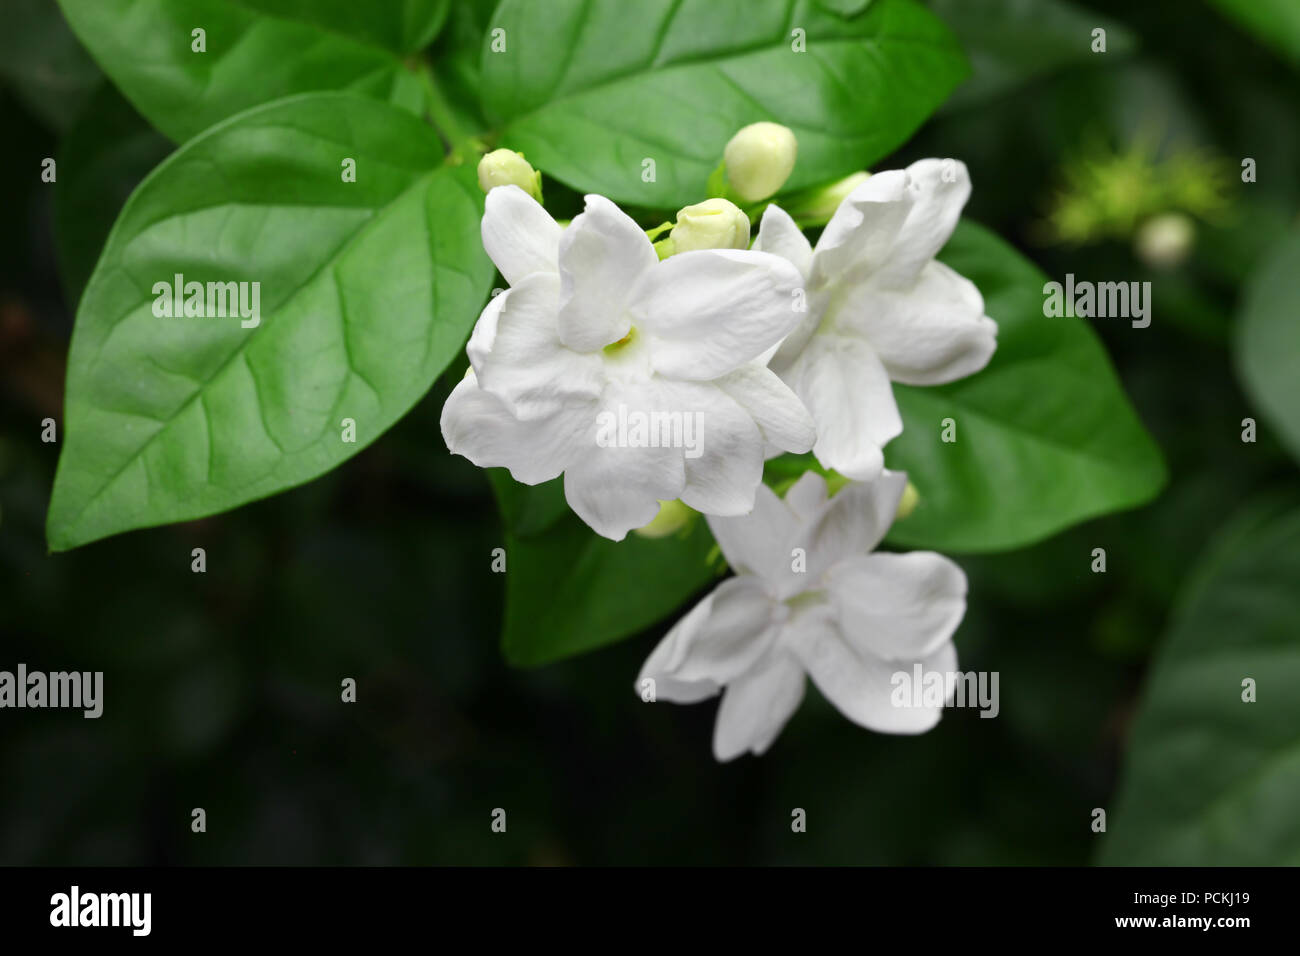 Jasmine Tea Flower Arabian Jasmine Jasminum Sambac Stock Photo